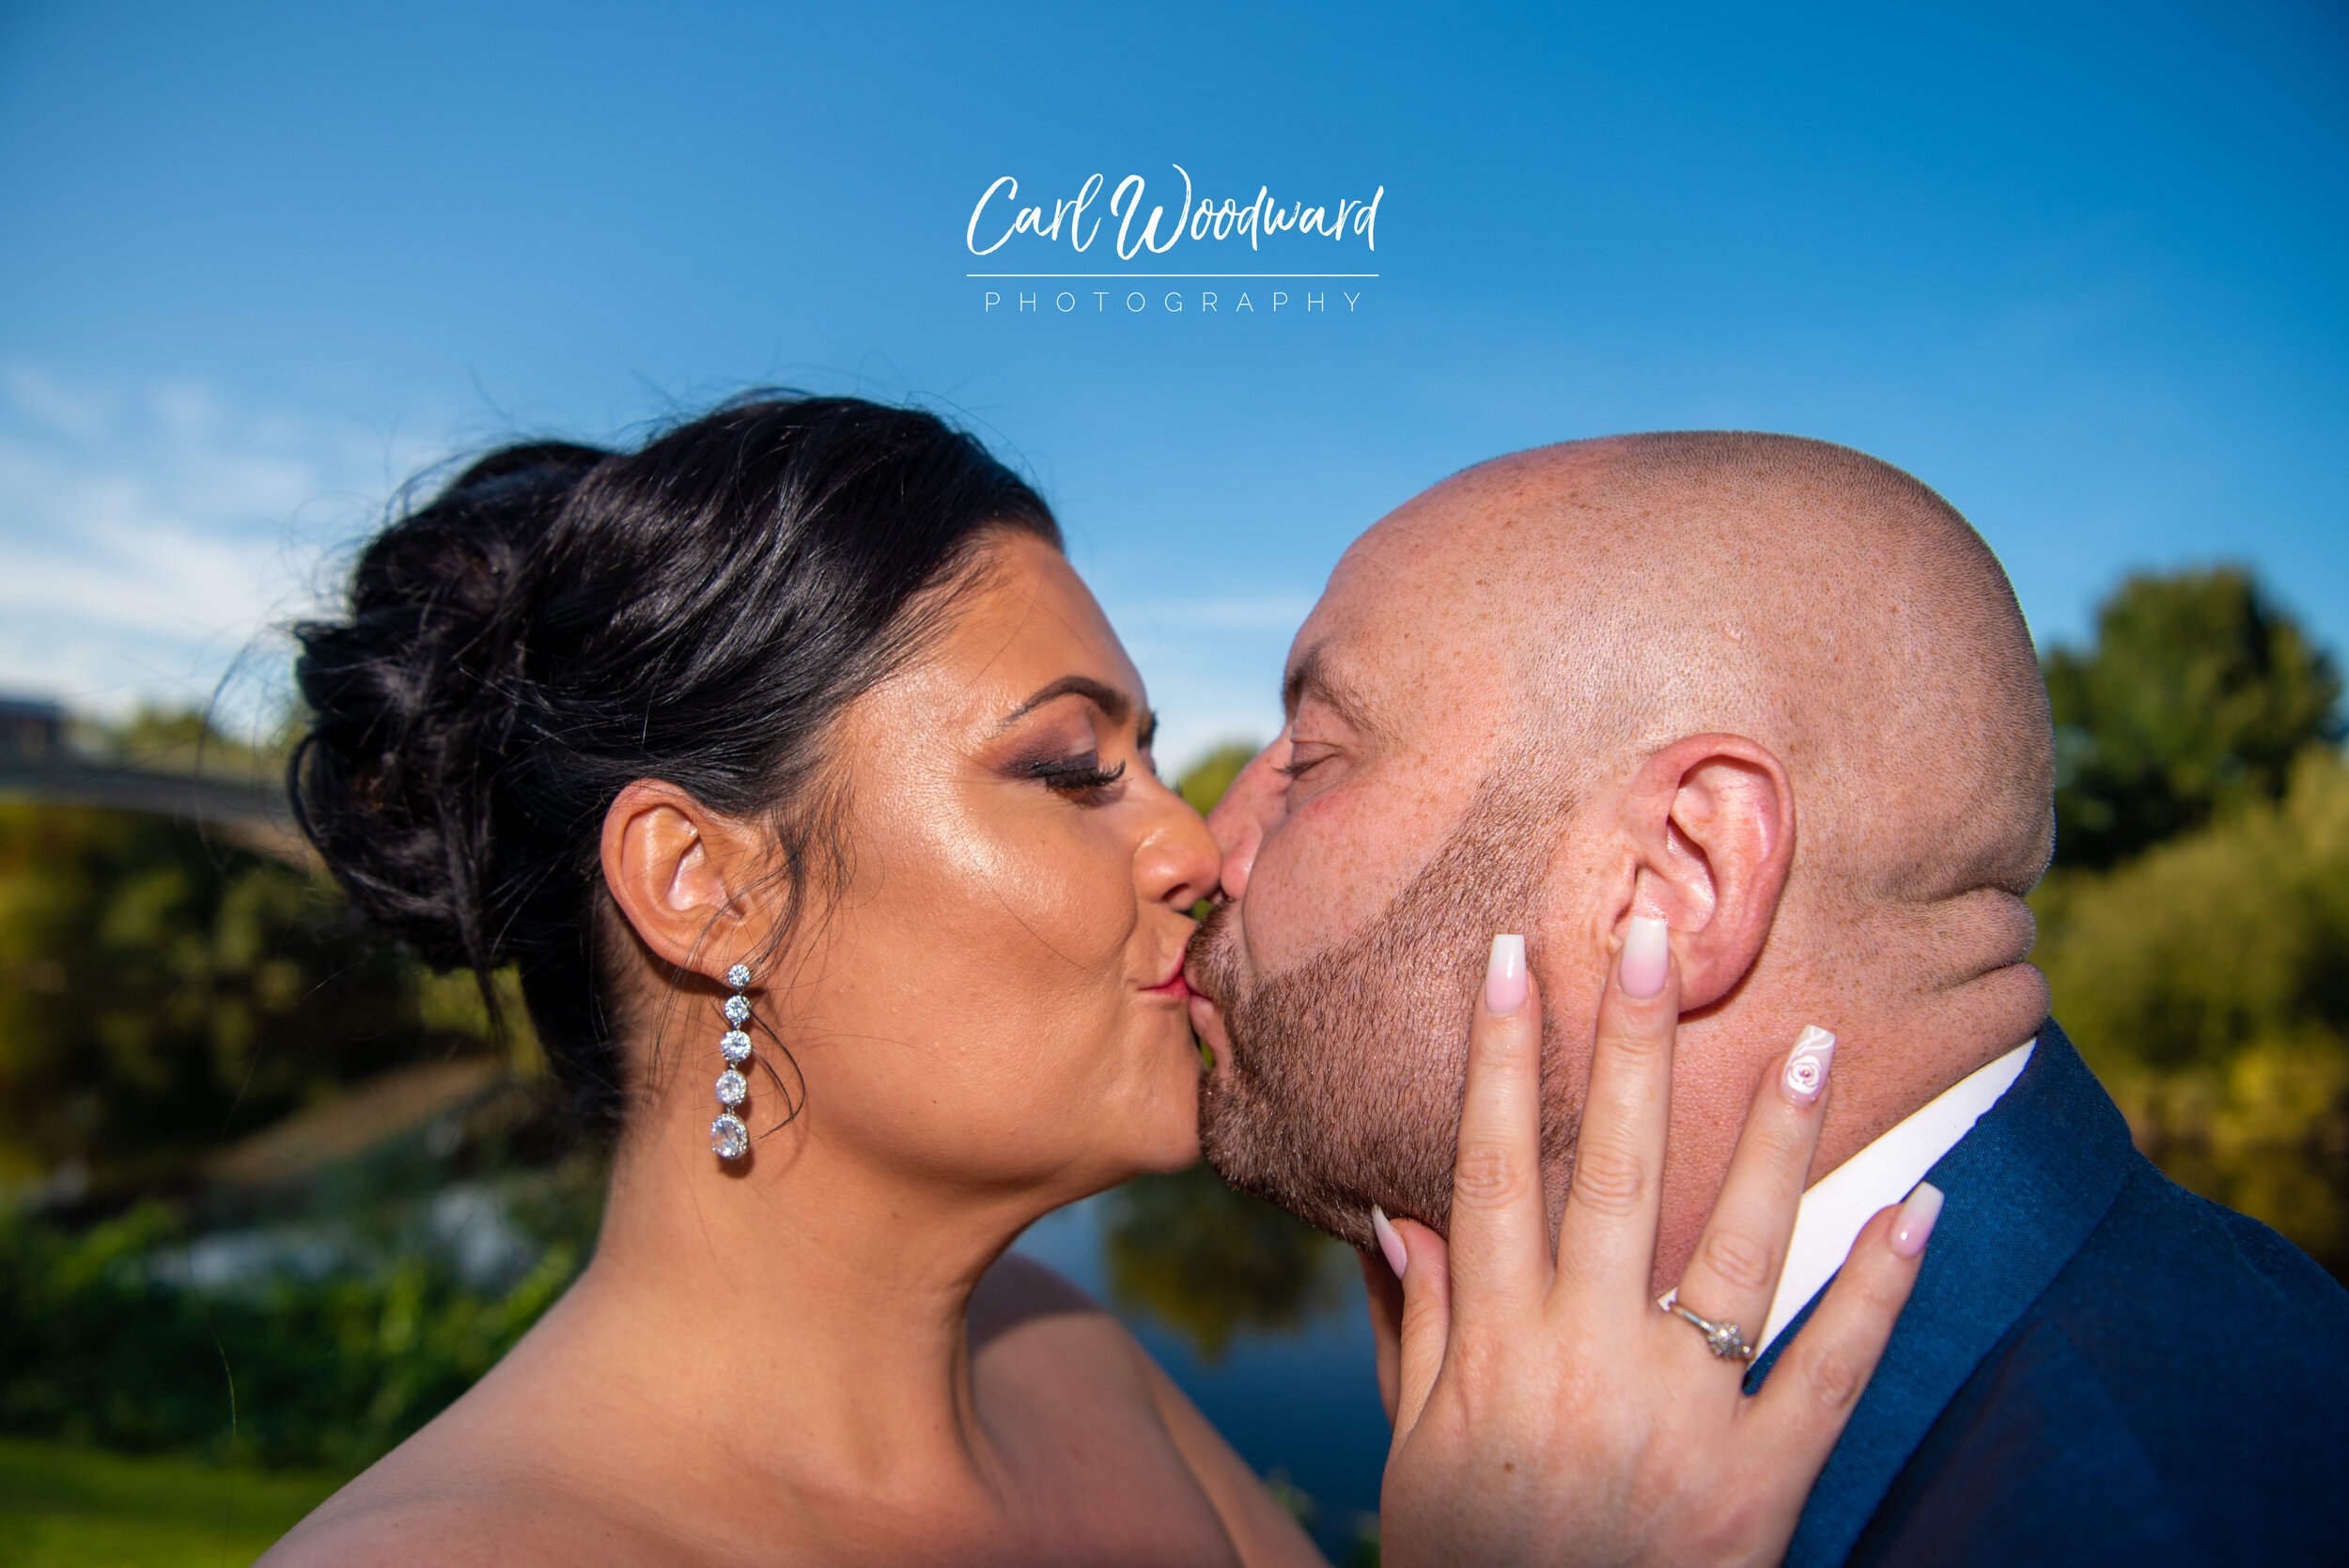 014-The-Holt-Fleet-Wedding-Photos.jpg